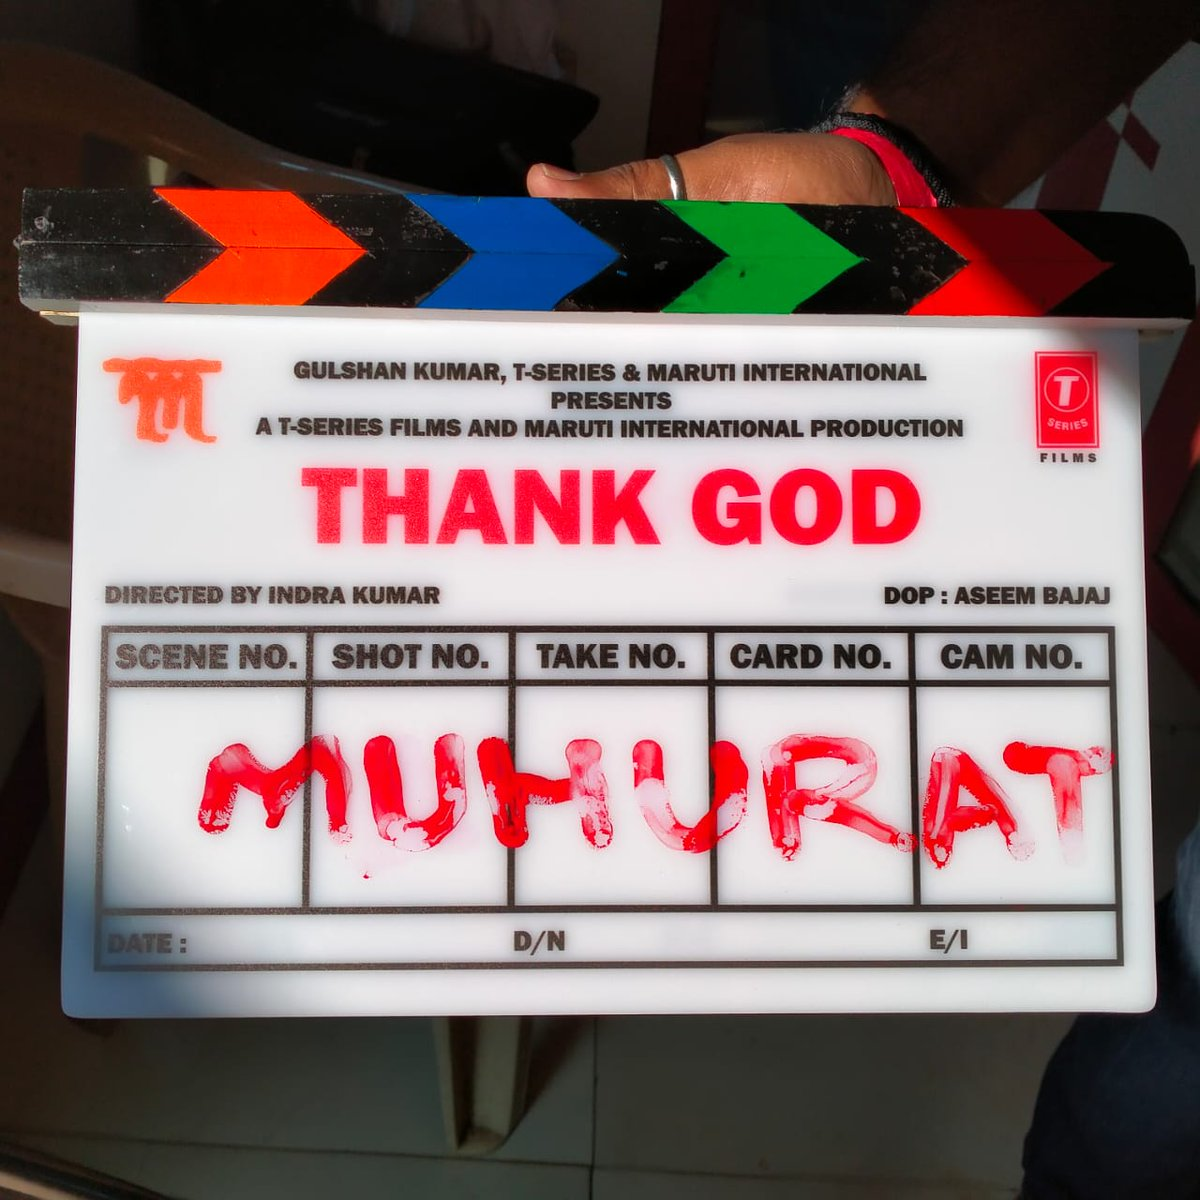 #ThankGod - Commences Shoot in #Mumbai Today.🔥 Starring #AjayDevgn, #SidharthMalhotra and #RakulPreet. Directed by Indra Kumar.  @SidMalhotra @Rakulpreet @Indra_kumar_9  #BhushanKumar #KrishanKumar #AshokThakeria @SunirKheterpal @DeepakMukut @MunnangiBalu @anandpandit63 @TSeries